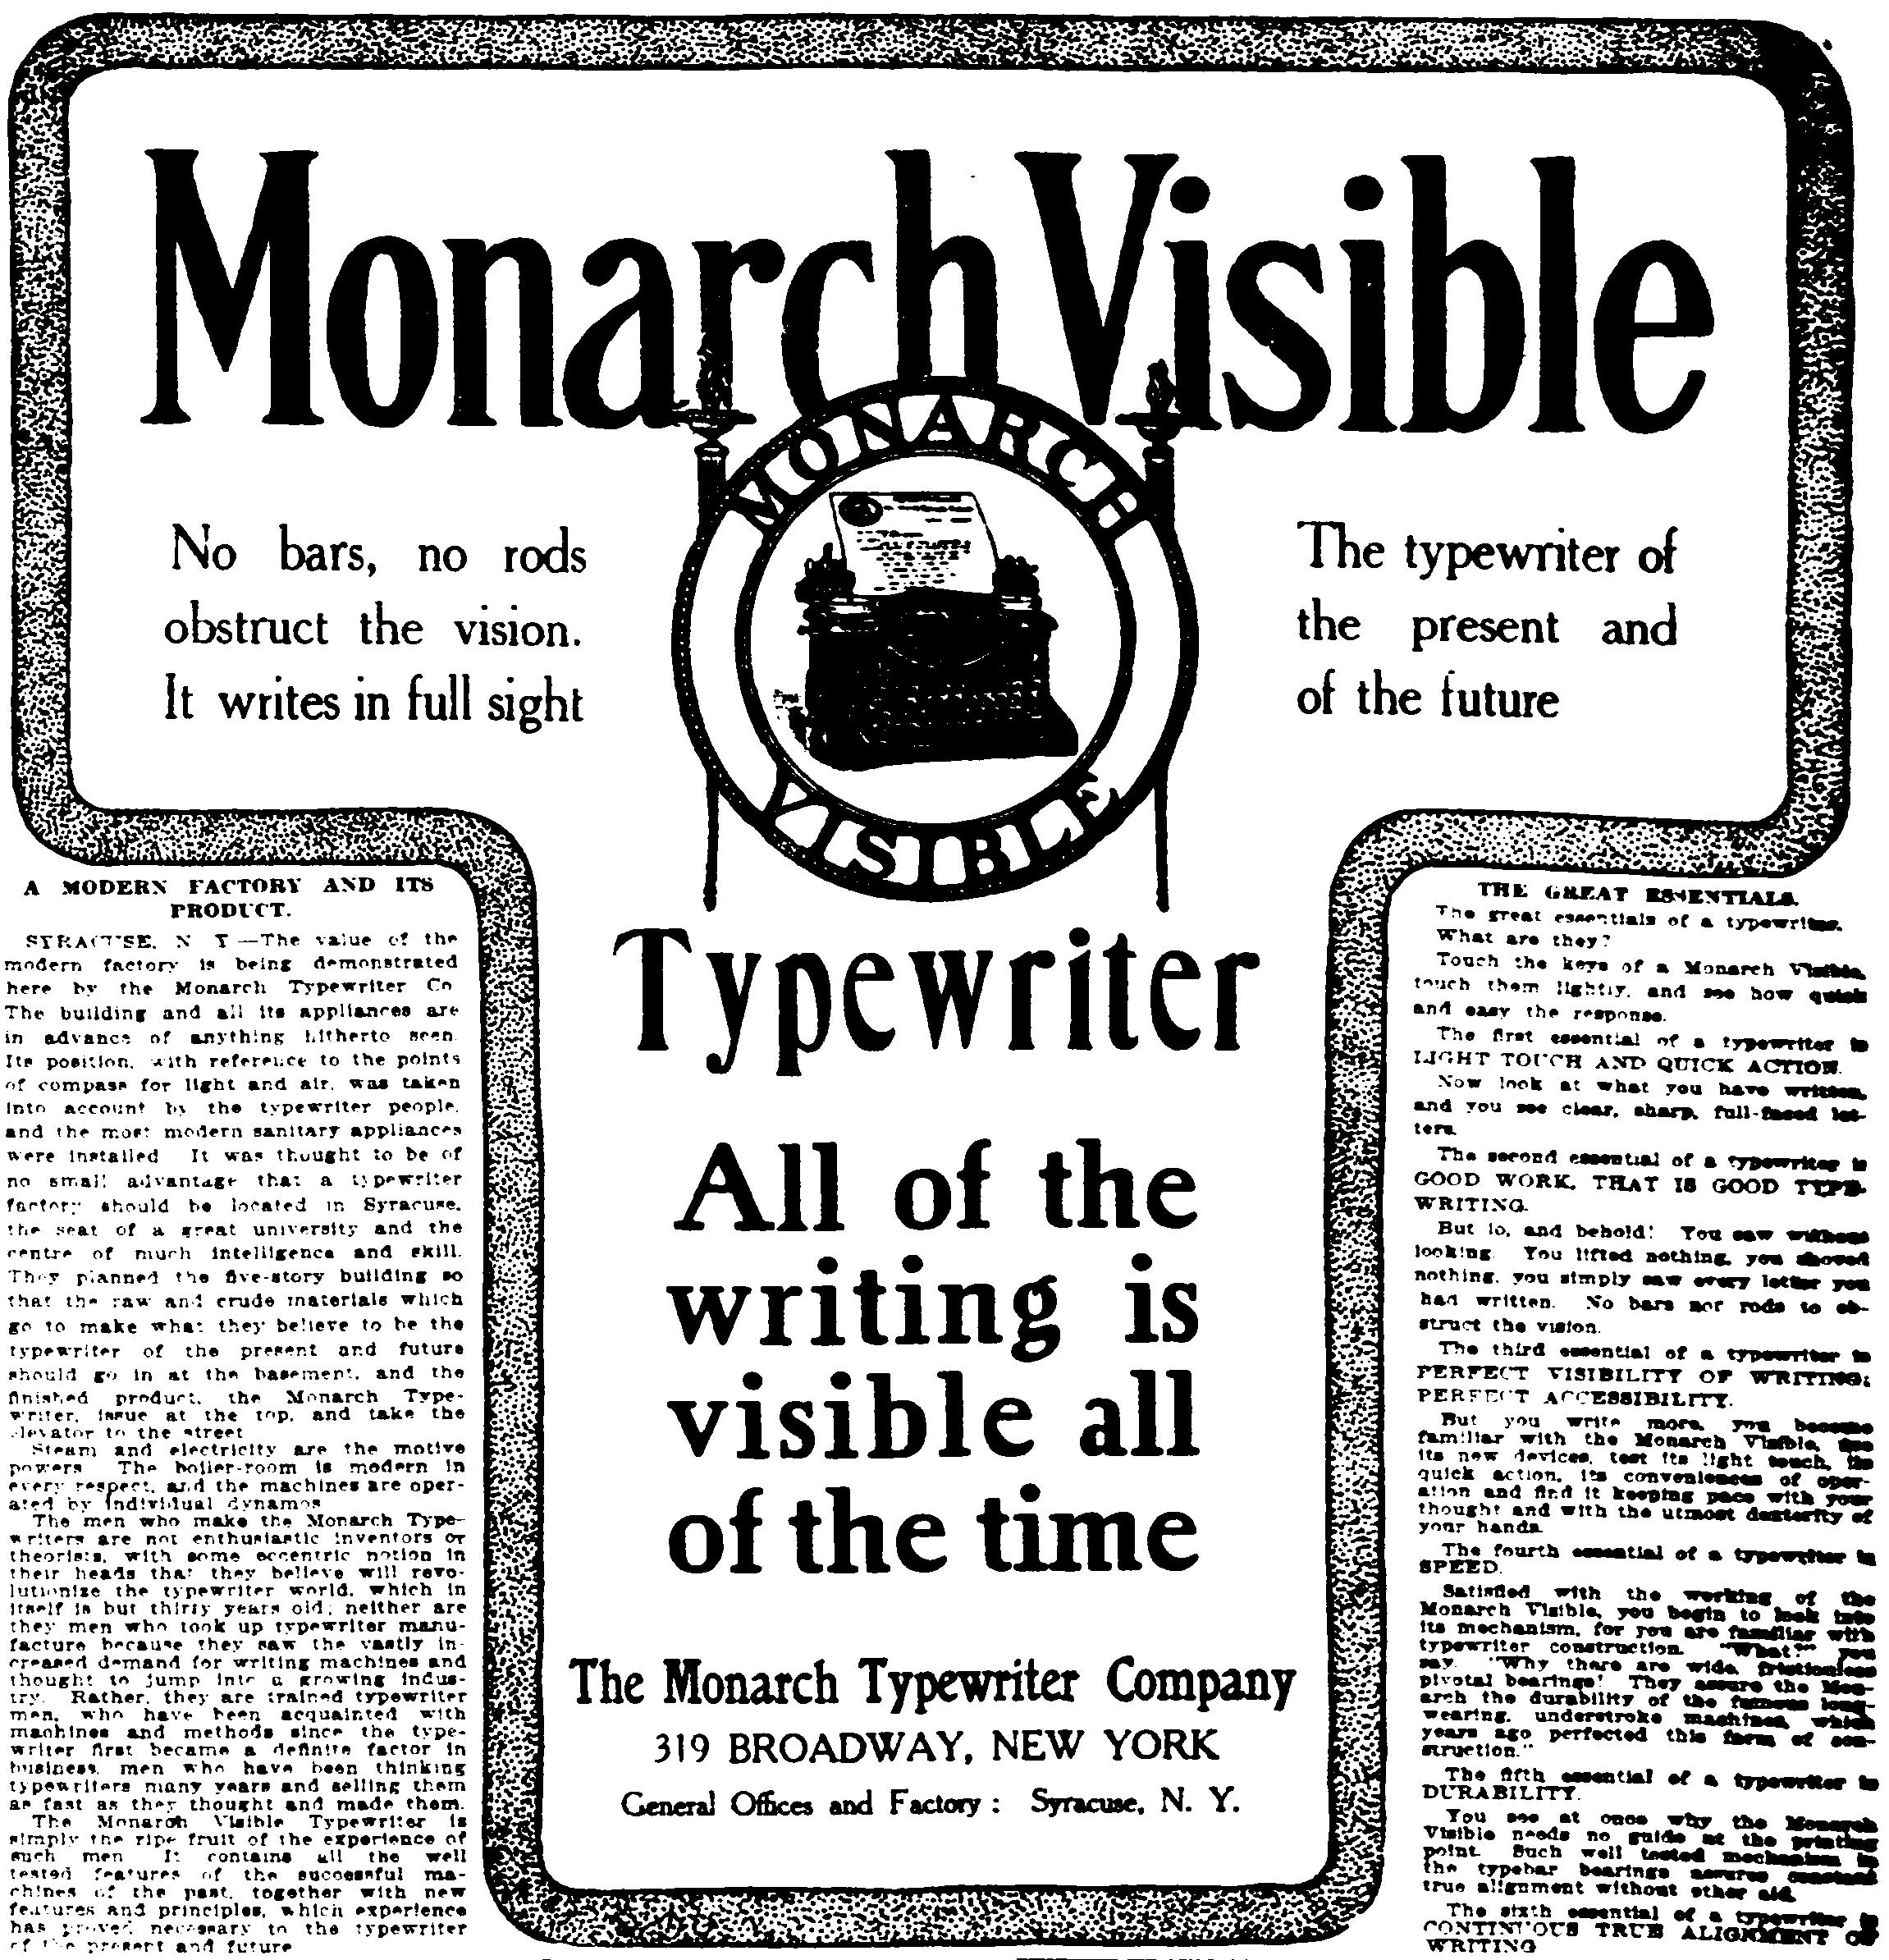 「Monarch Visible」の広告(『New-York Tribune』1905年1月23日)